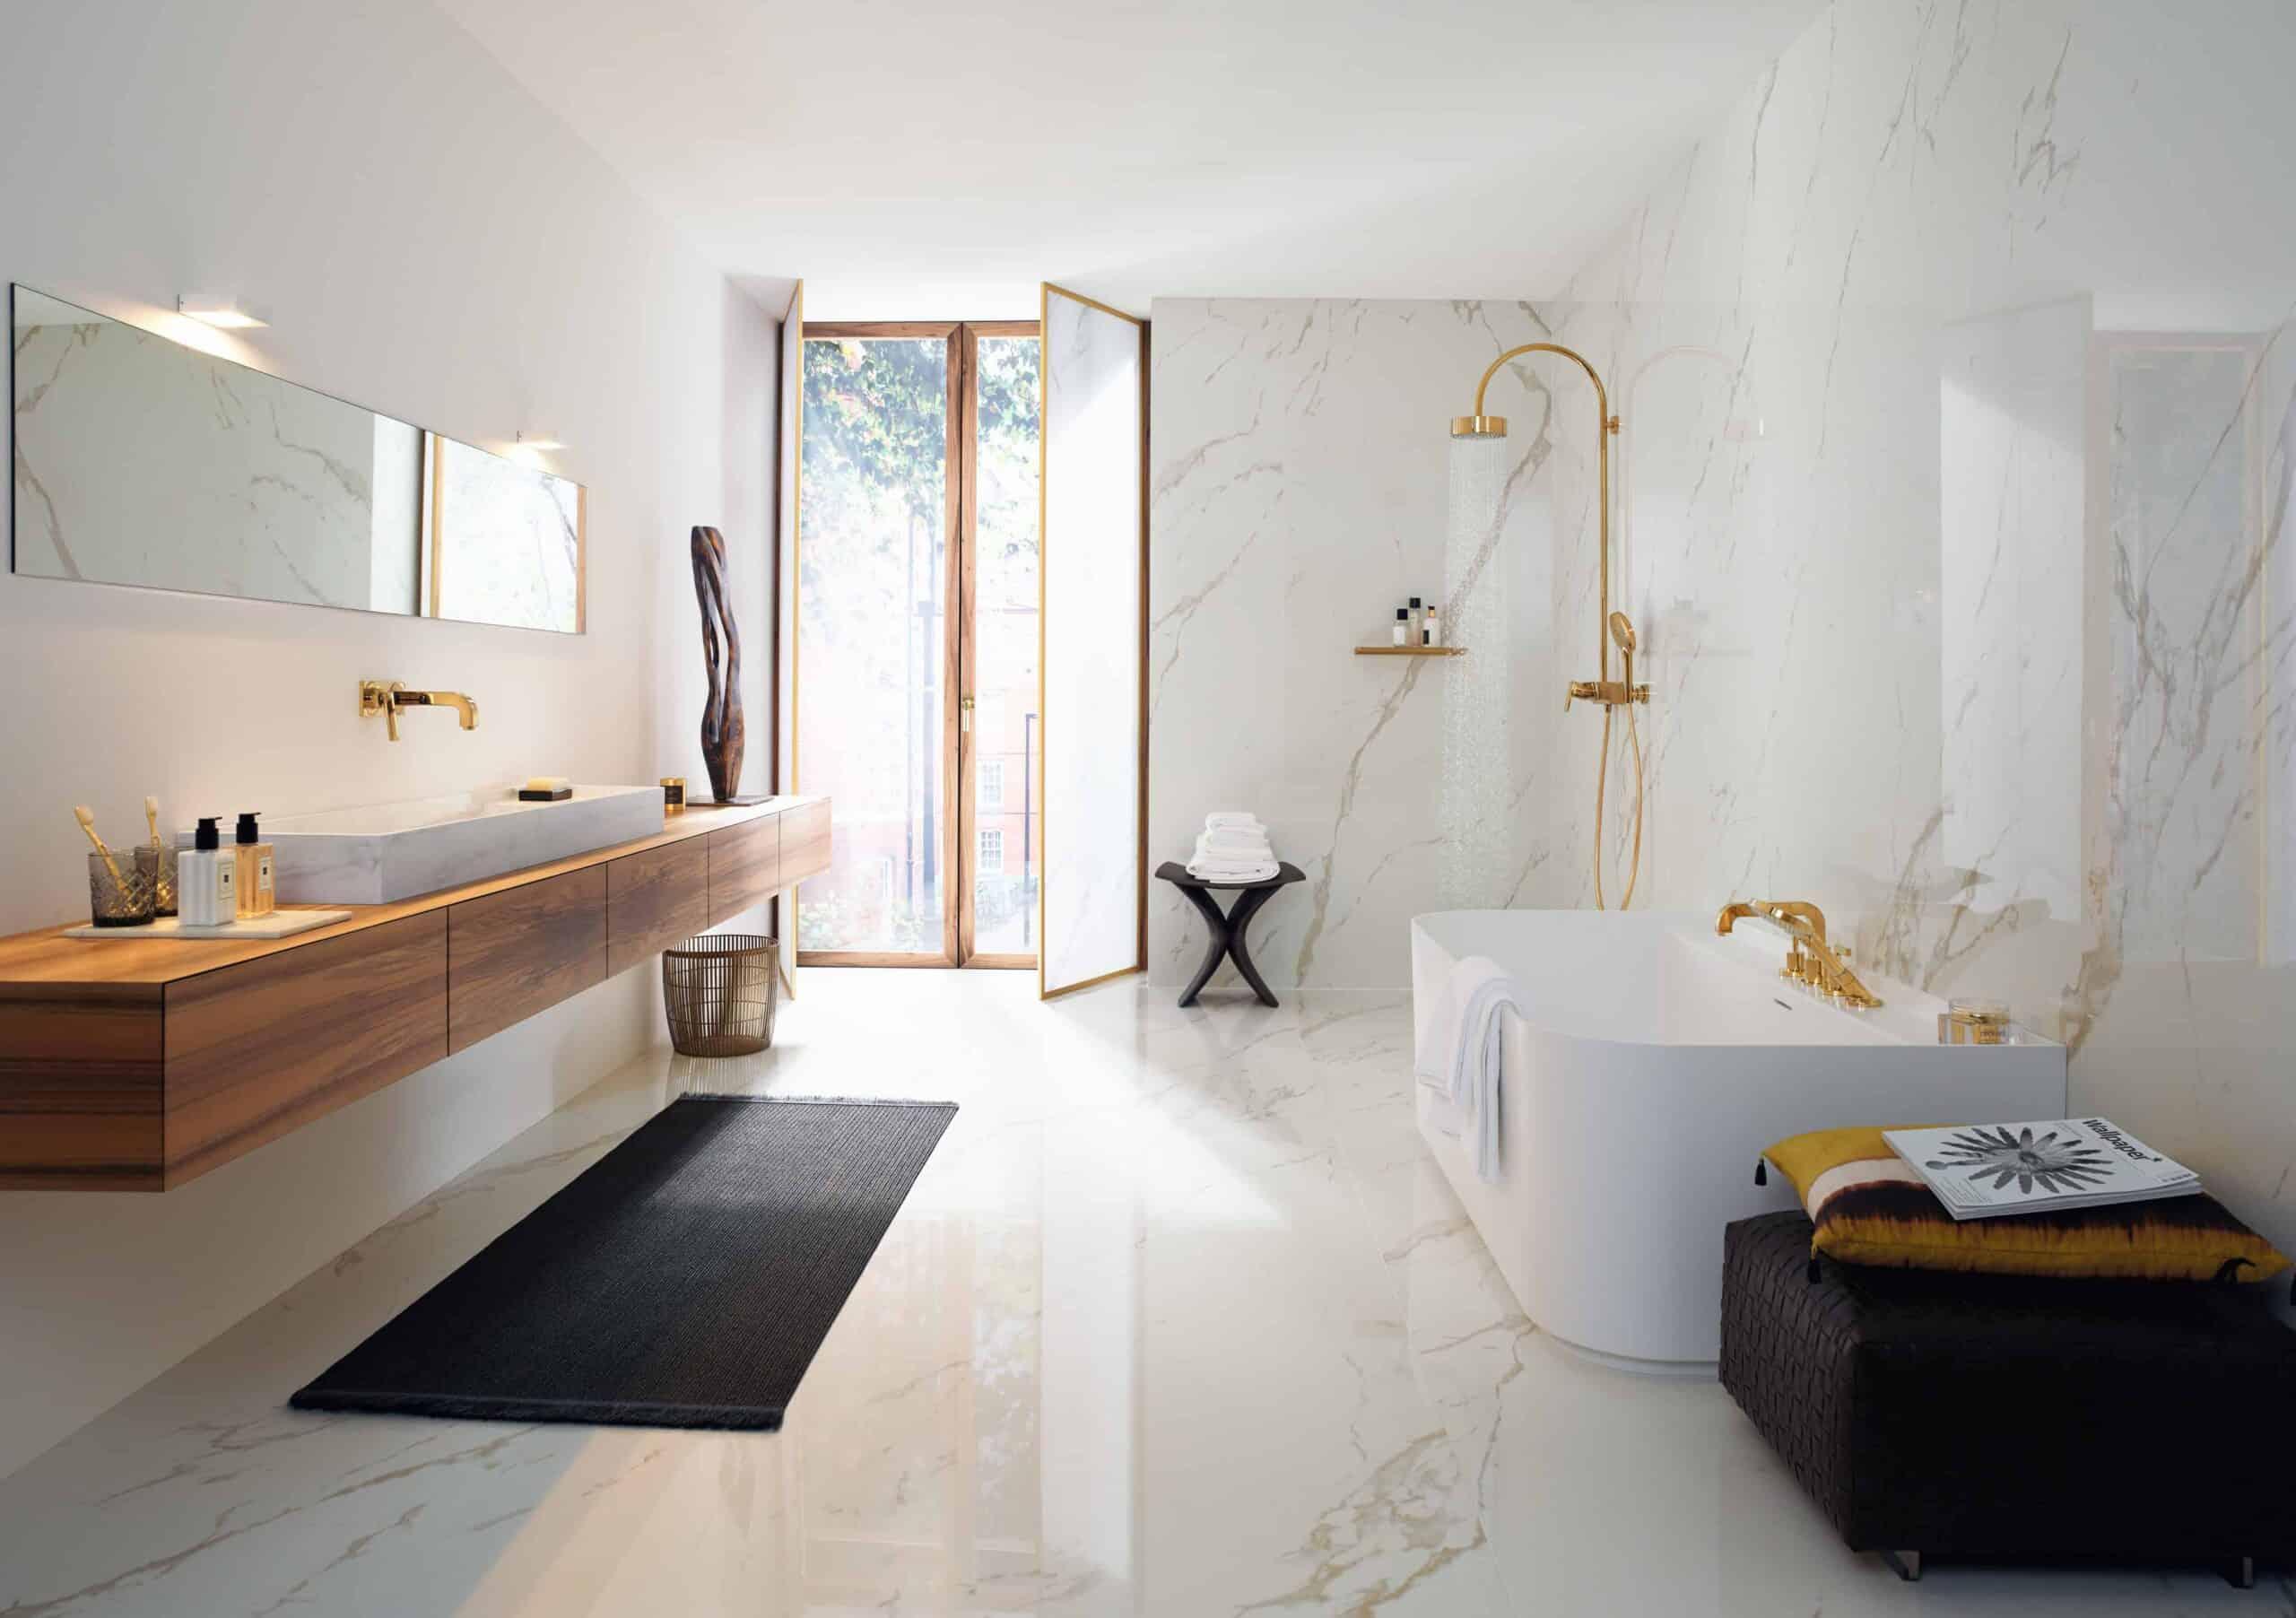 AXOR Citterio modern bathroom design collection, white and gold themed bathroom